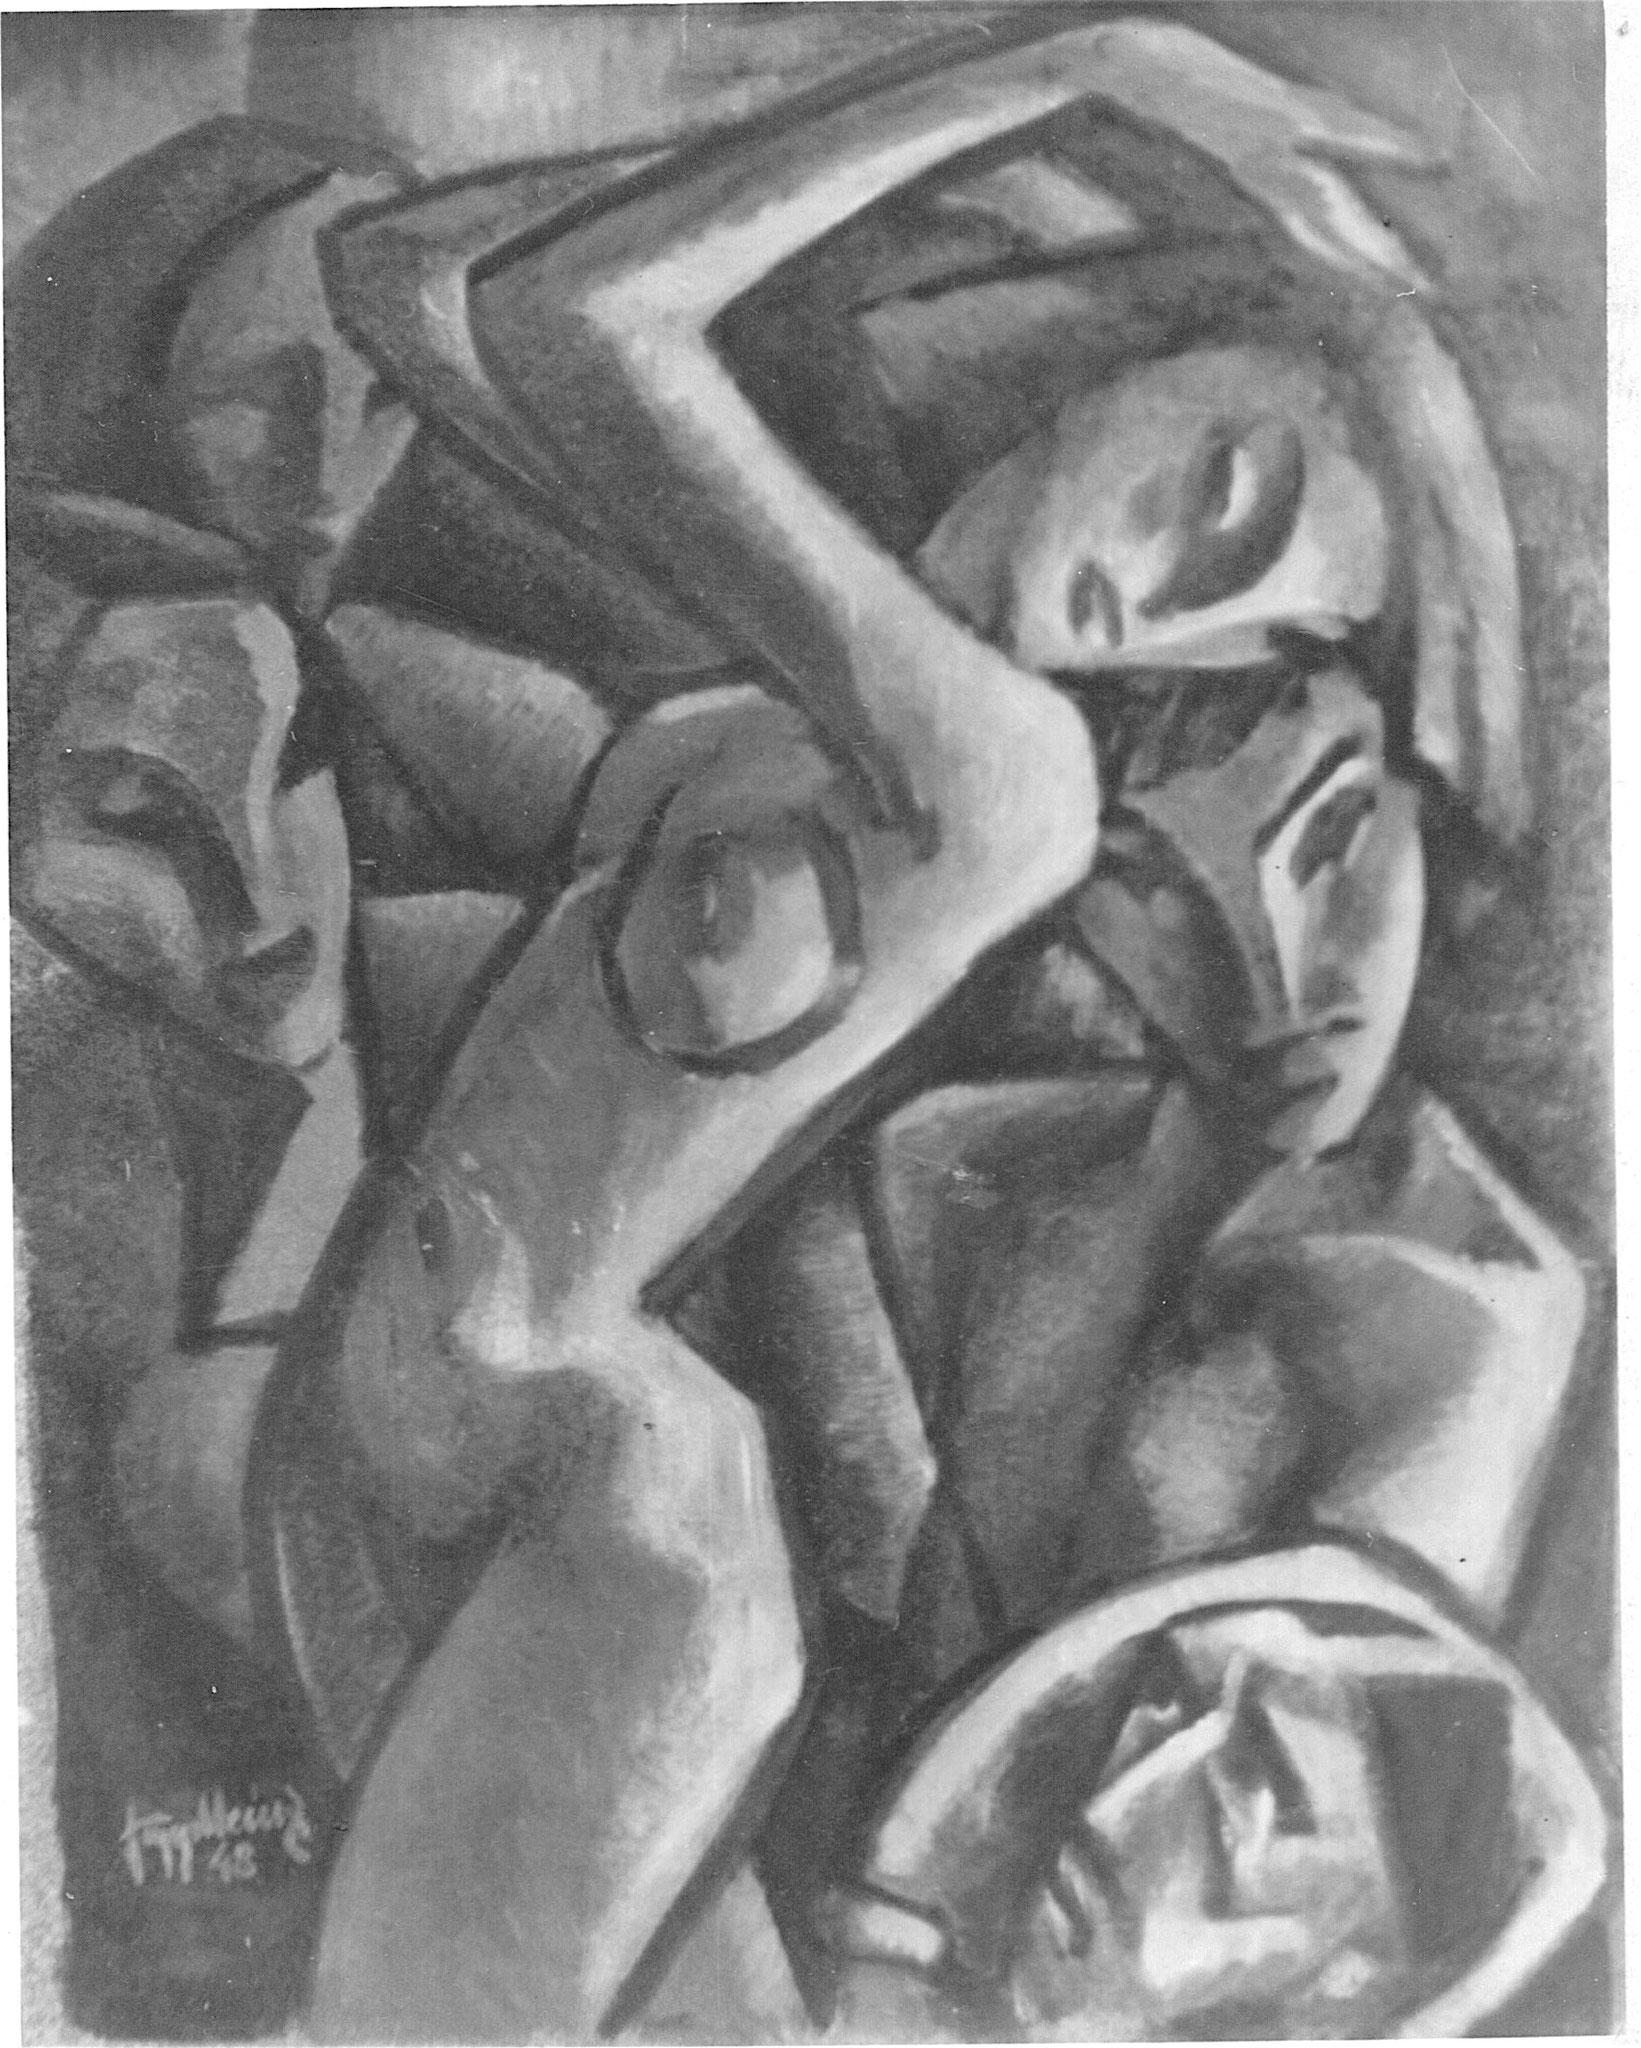 Frauenbild 1948 / 2